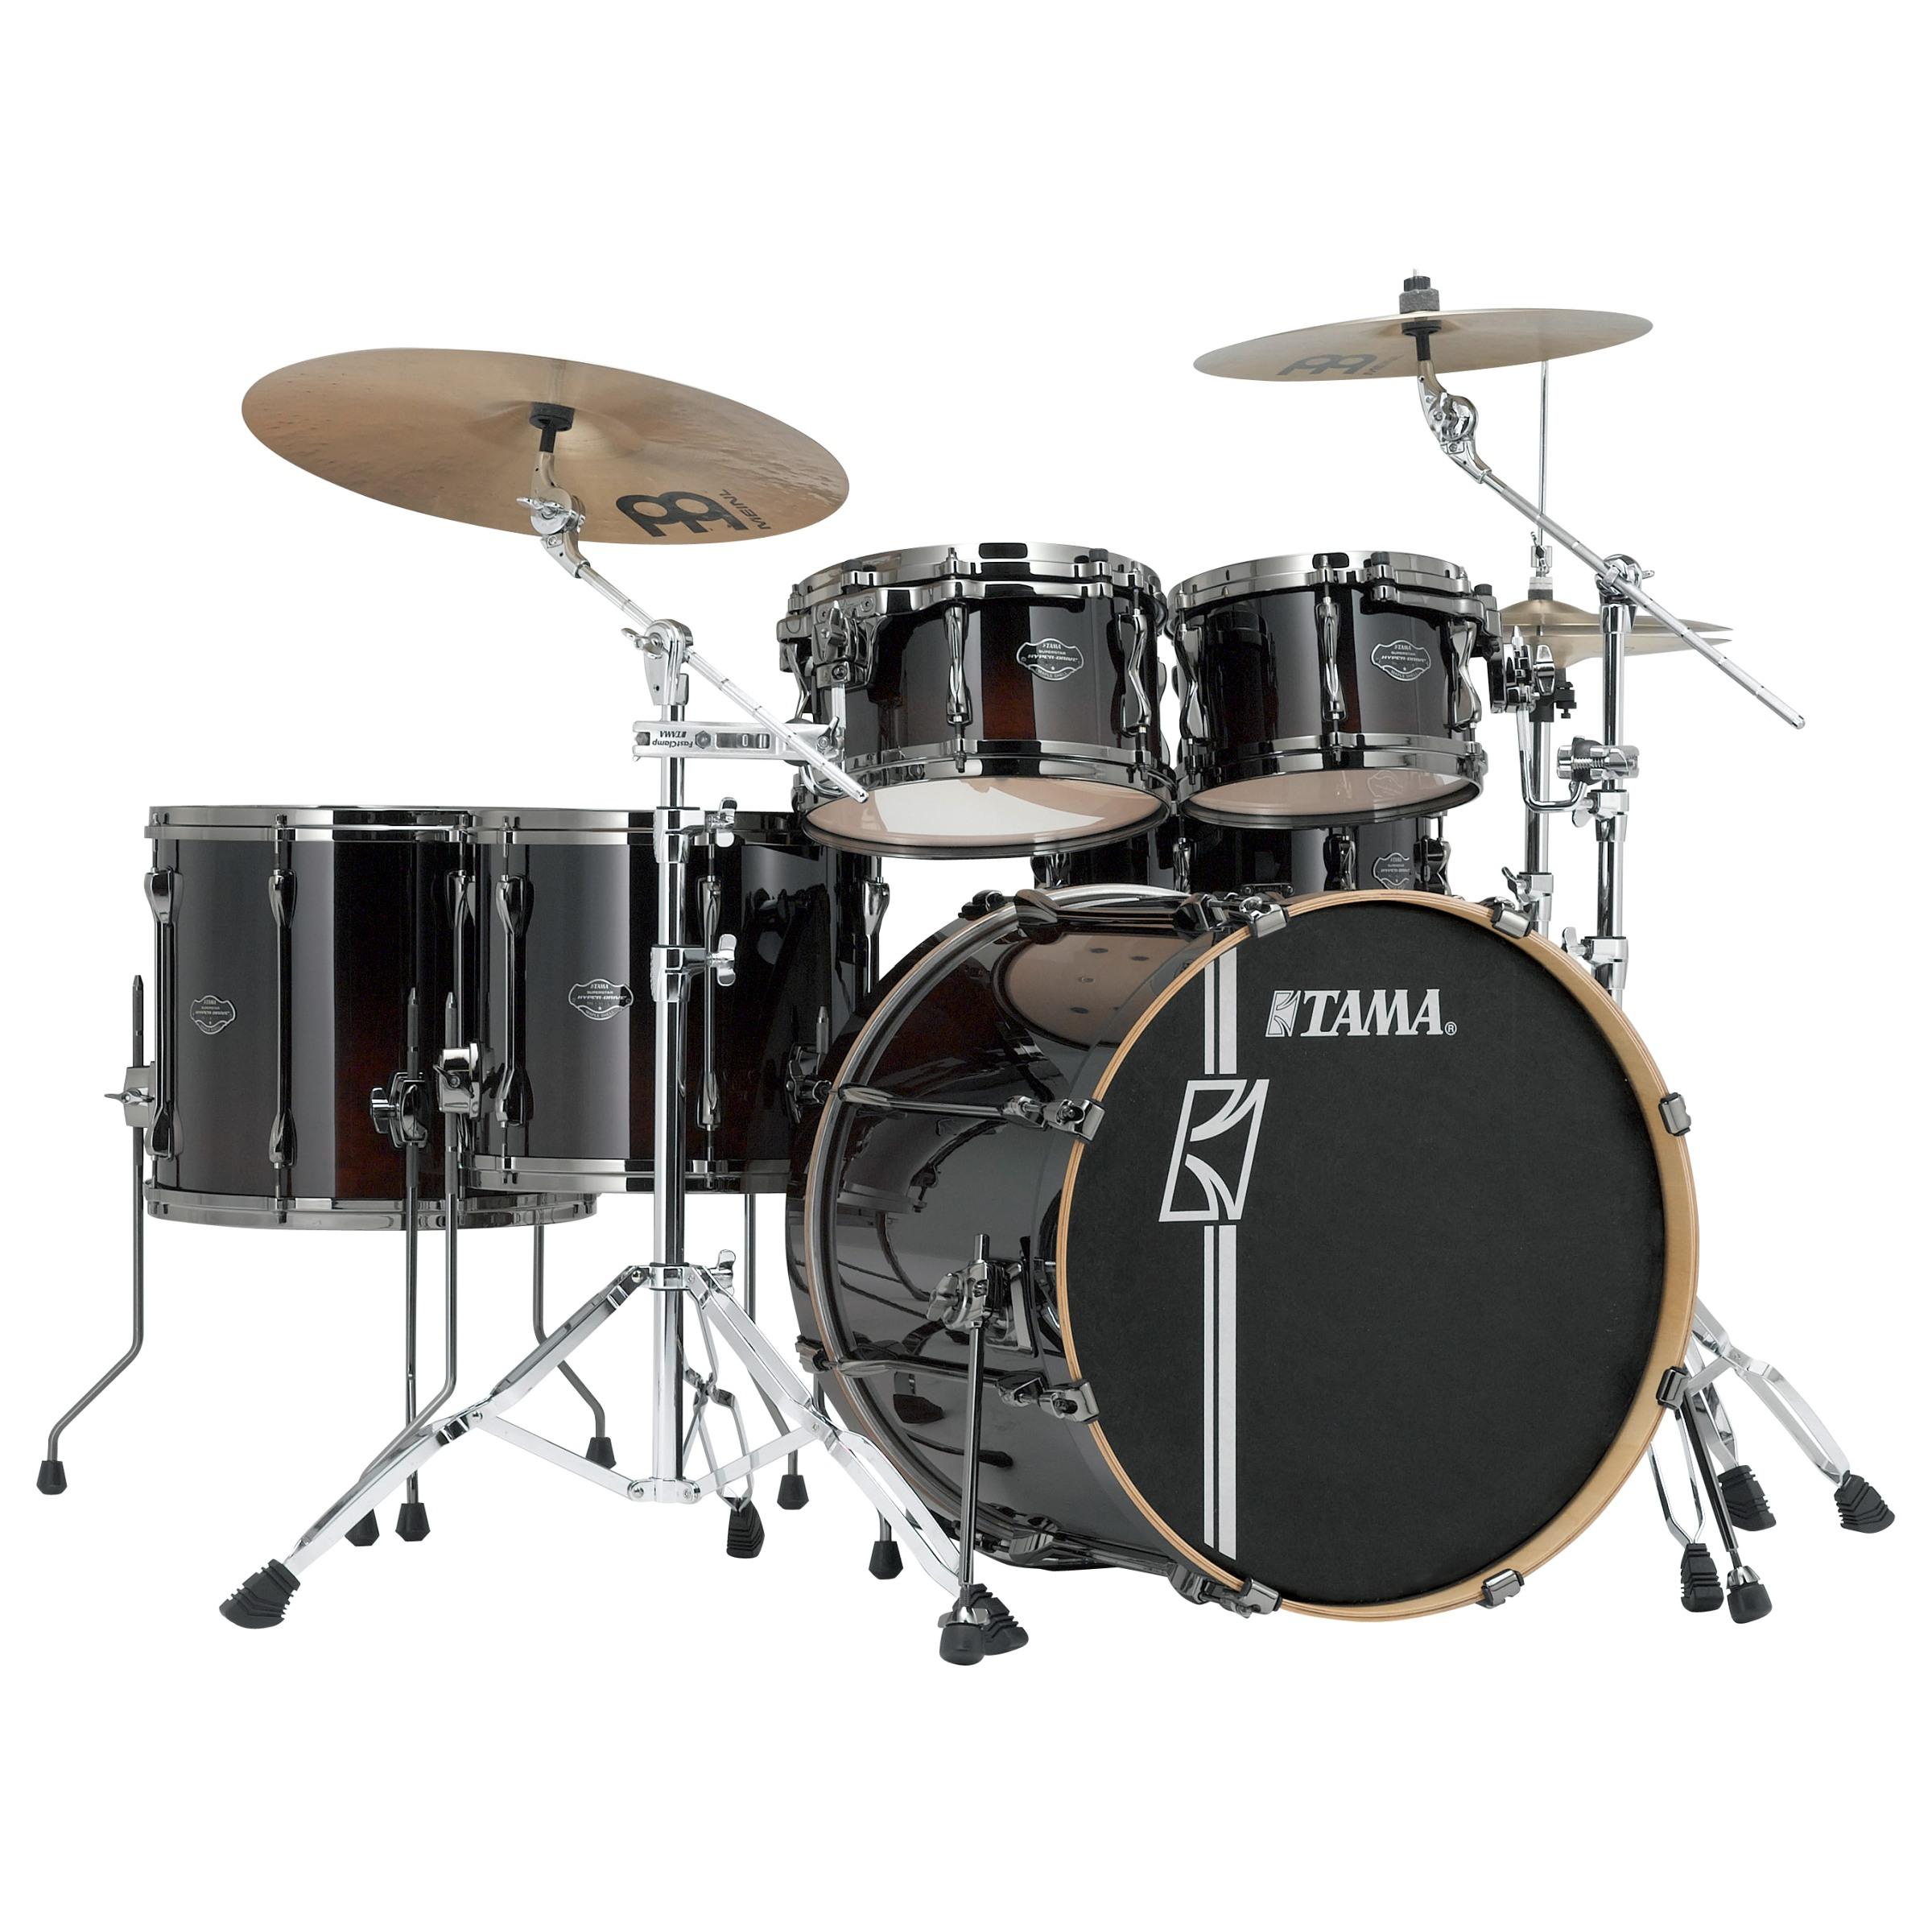 "TAMA Superstar Hyper-Drive Drumset 5-teilig 22""/10""/12""/14""/16"" Dark Mocha Fade, inklusive Hardware ohne Snare"